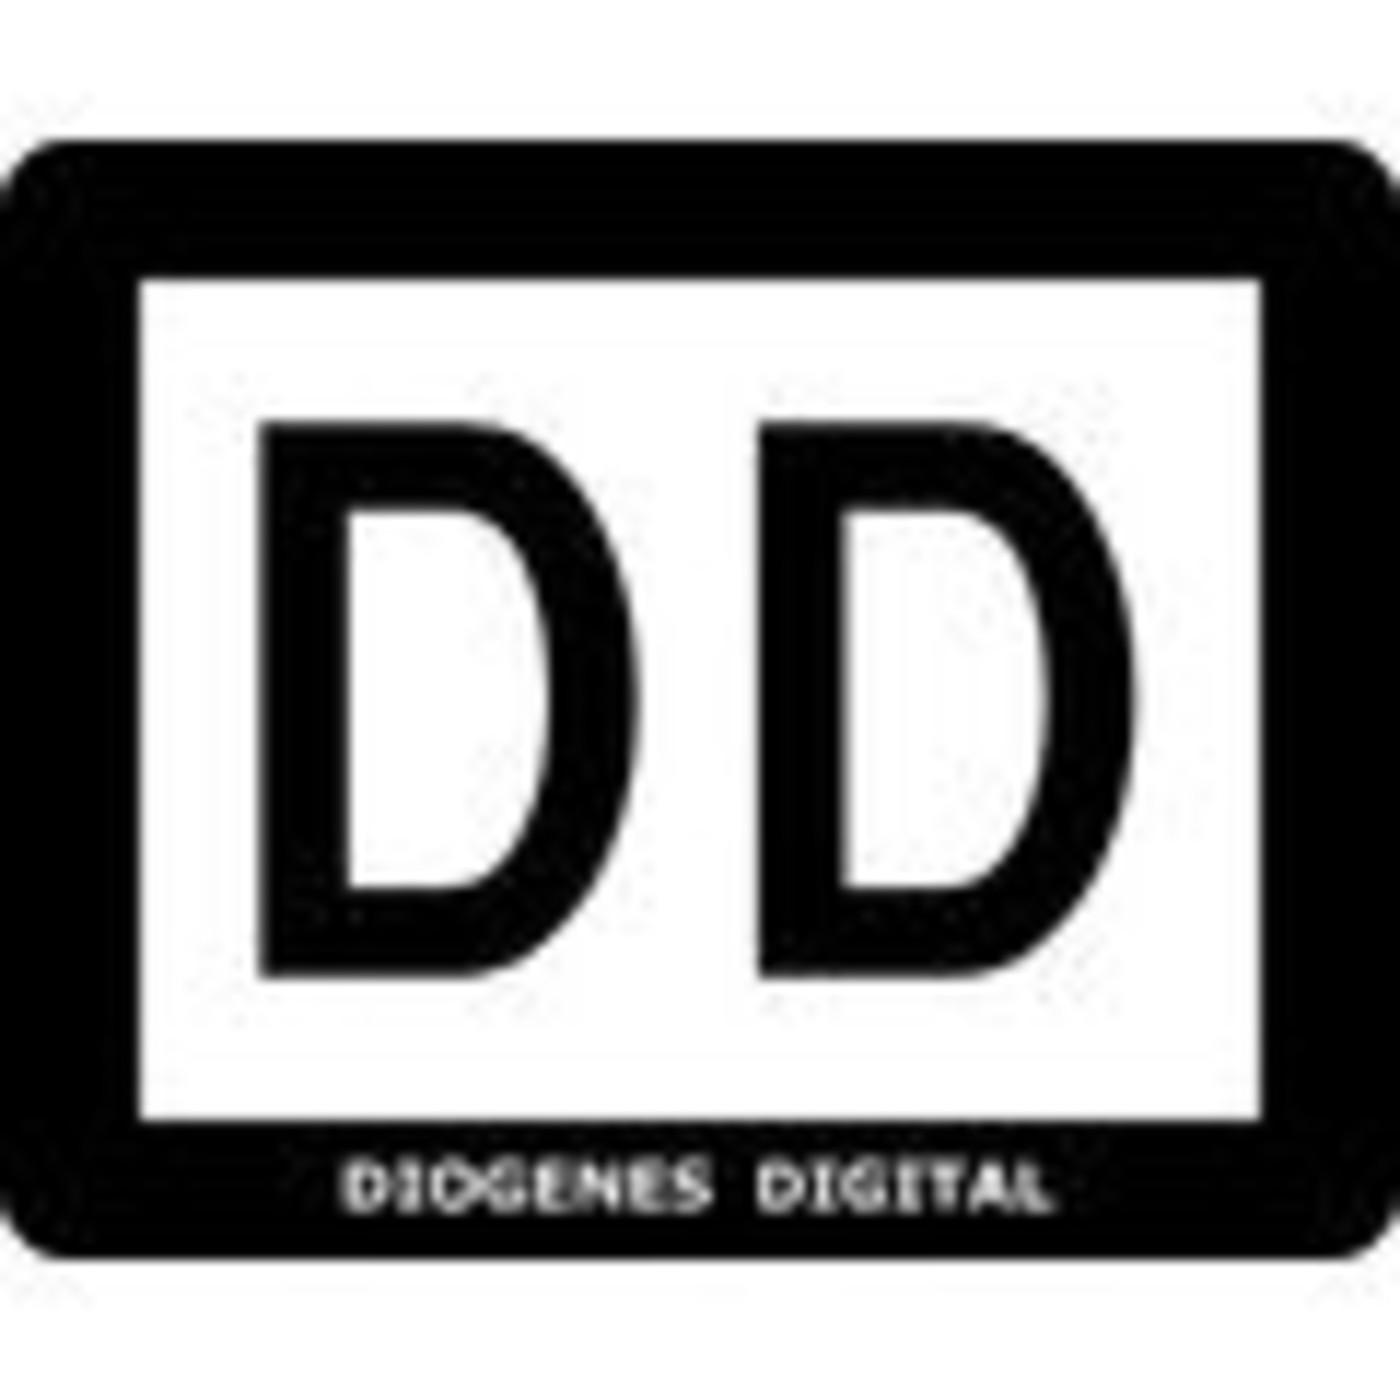 DiogenesDigital